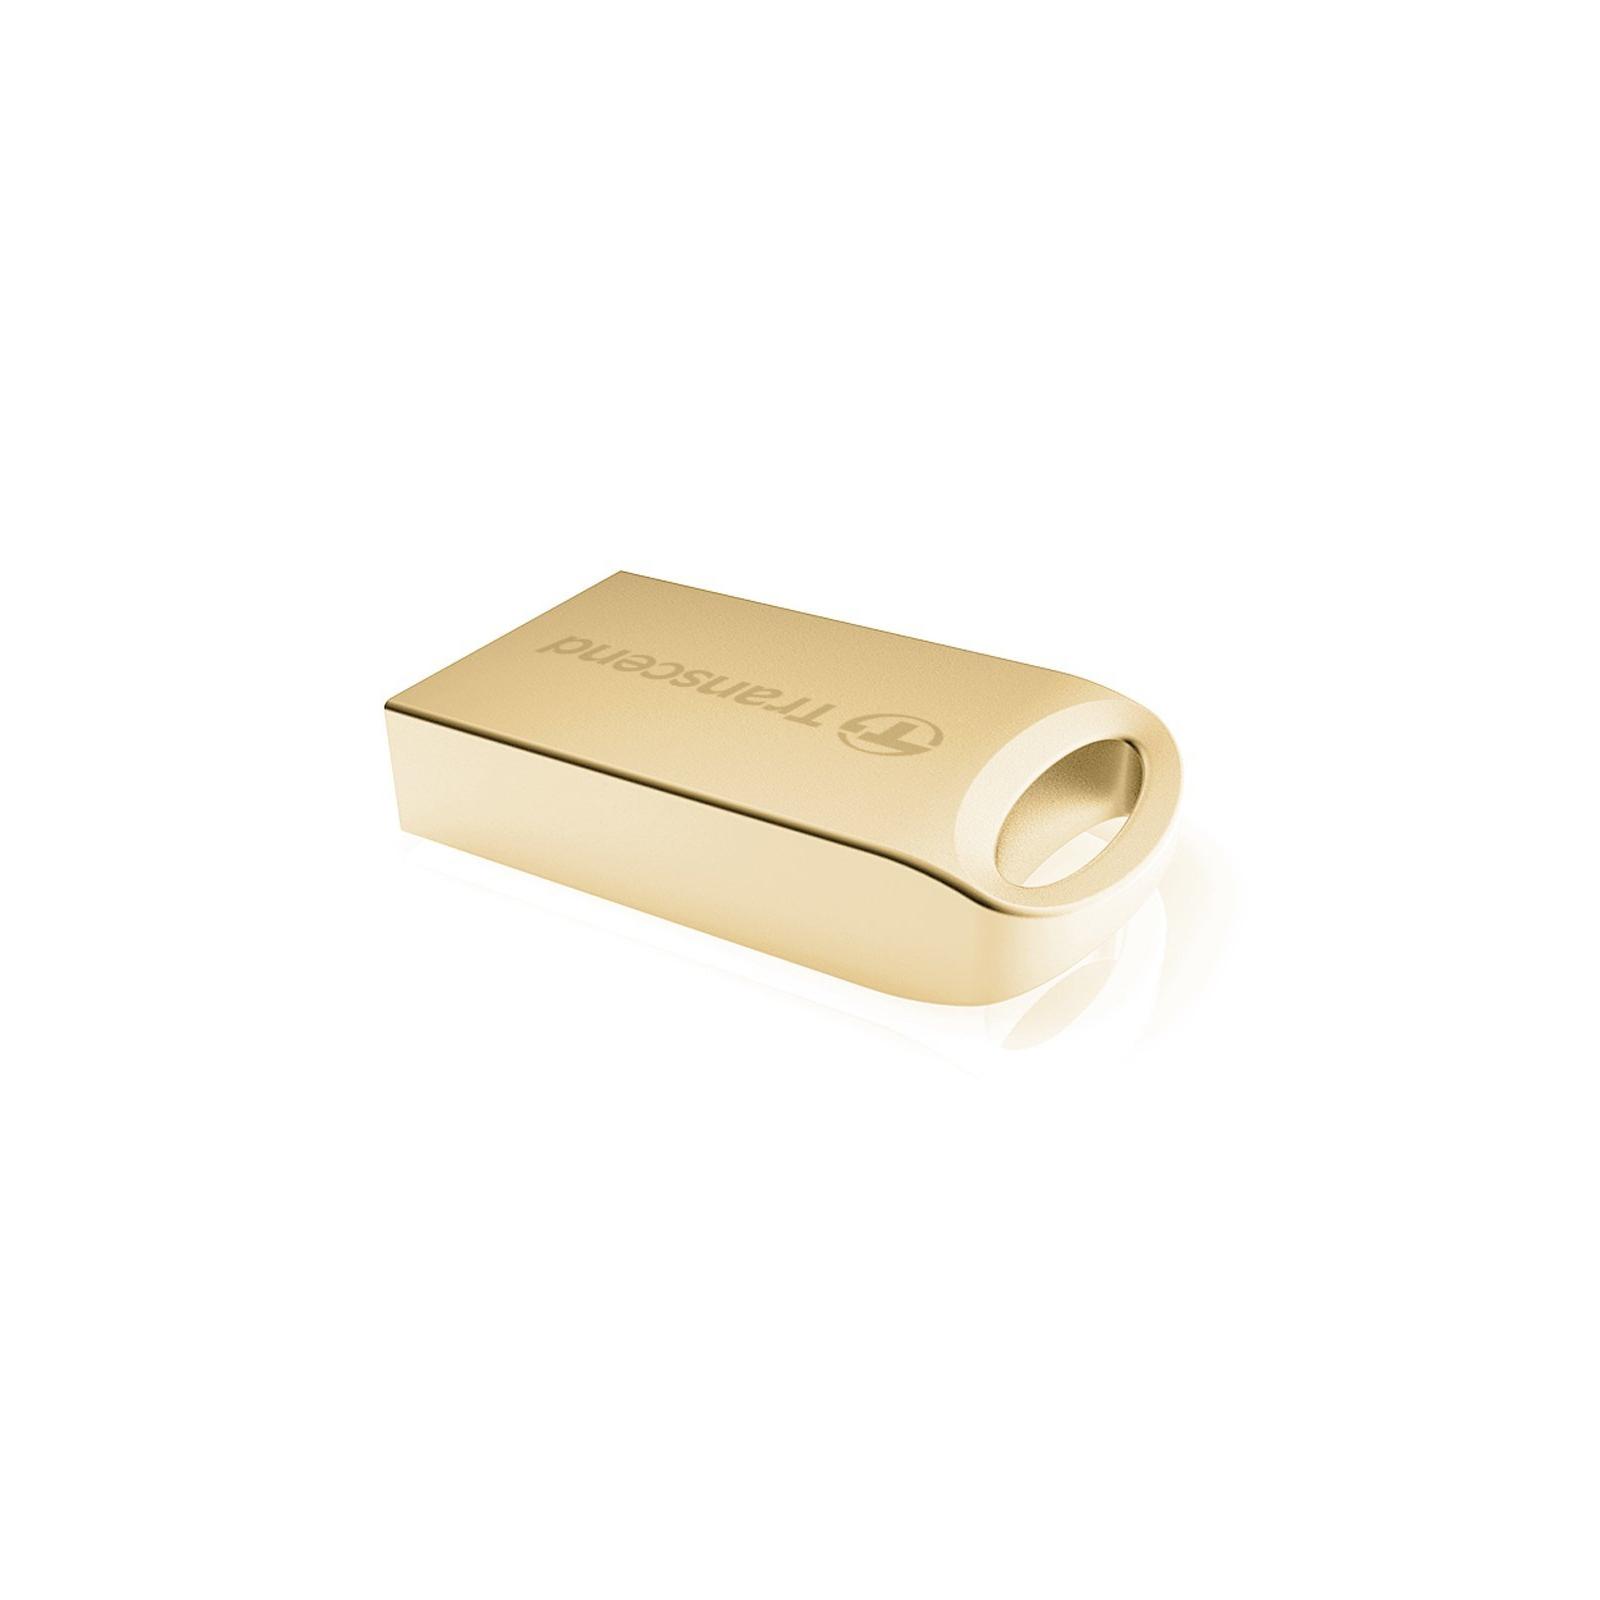 USB флеш накопитель Transcend JetFlash 510, Gold Plating (TS32GJF510G) изображение 2